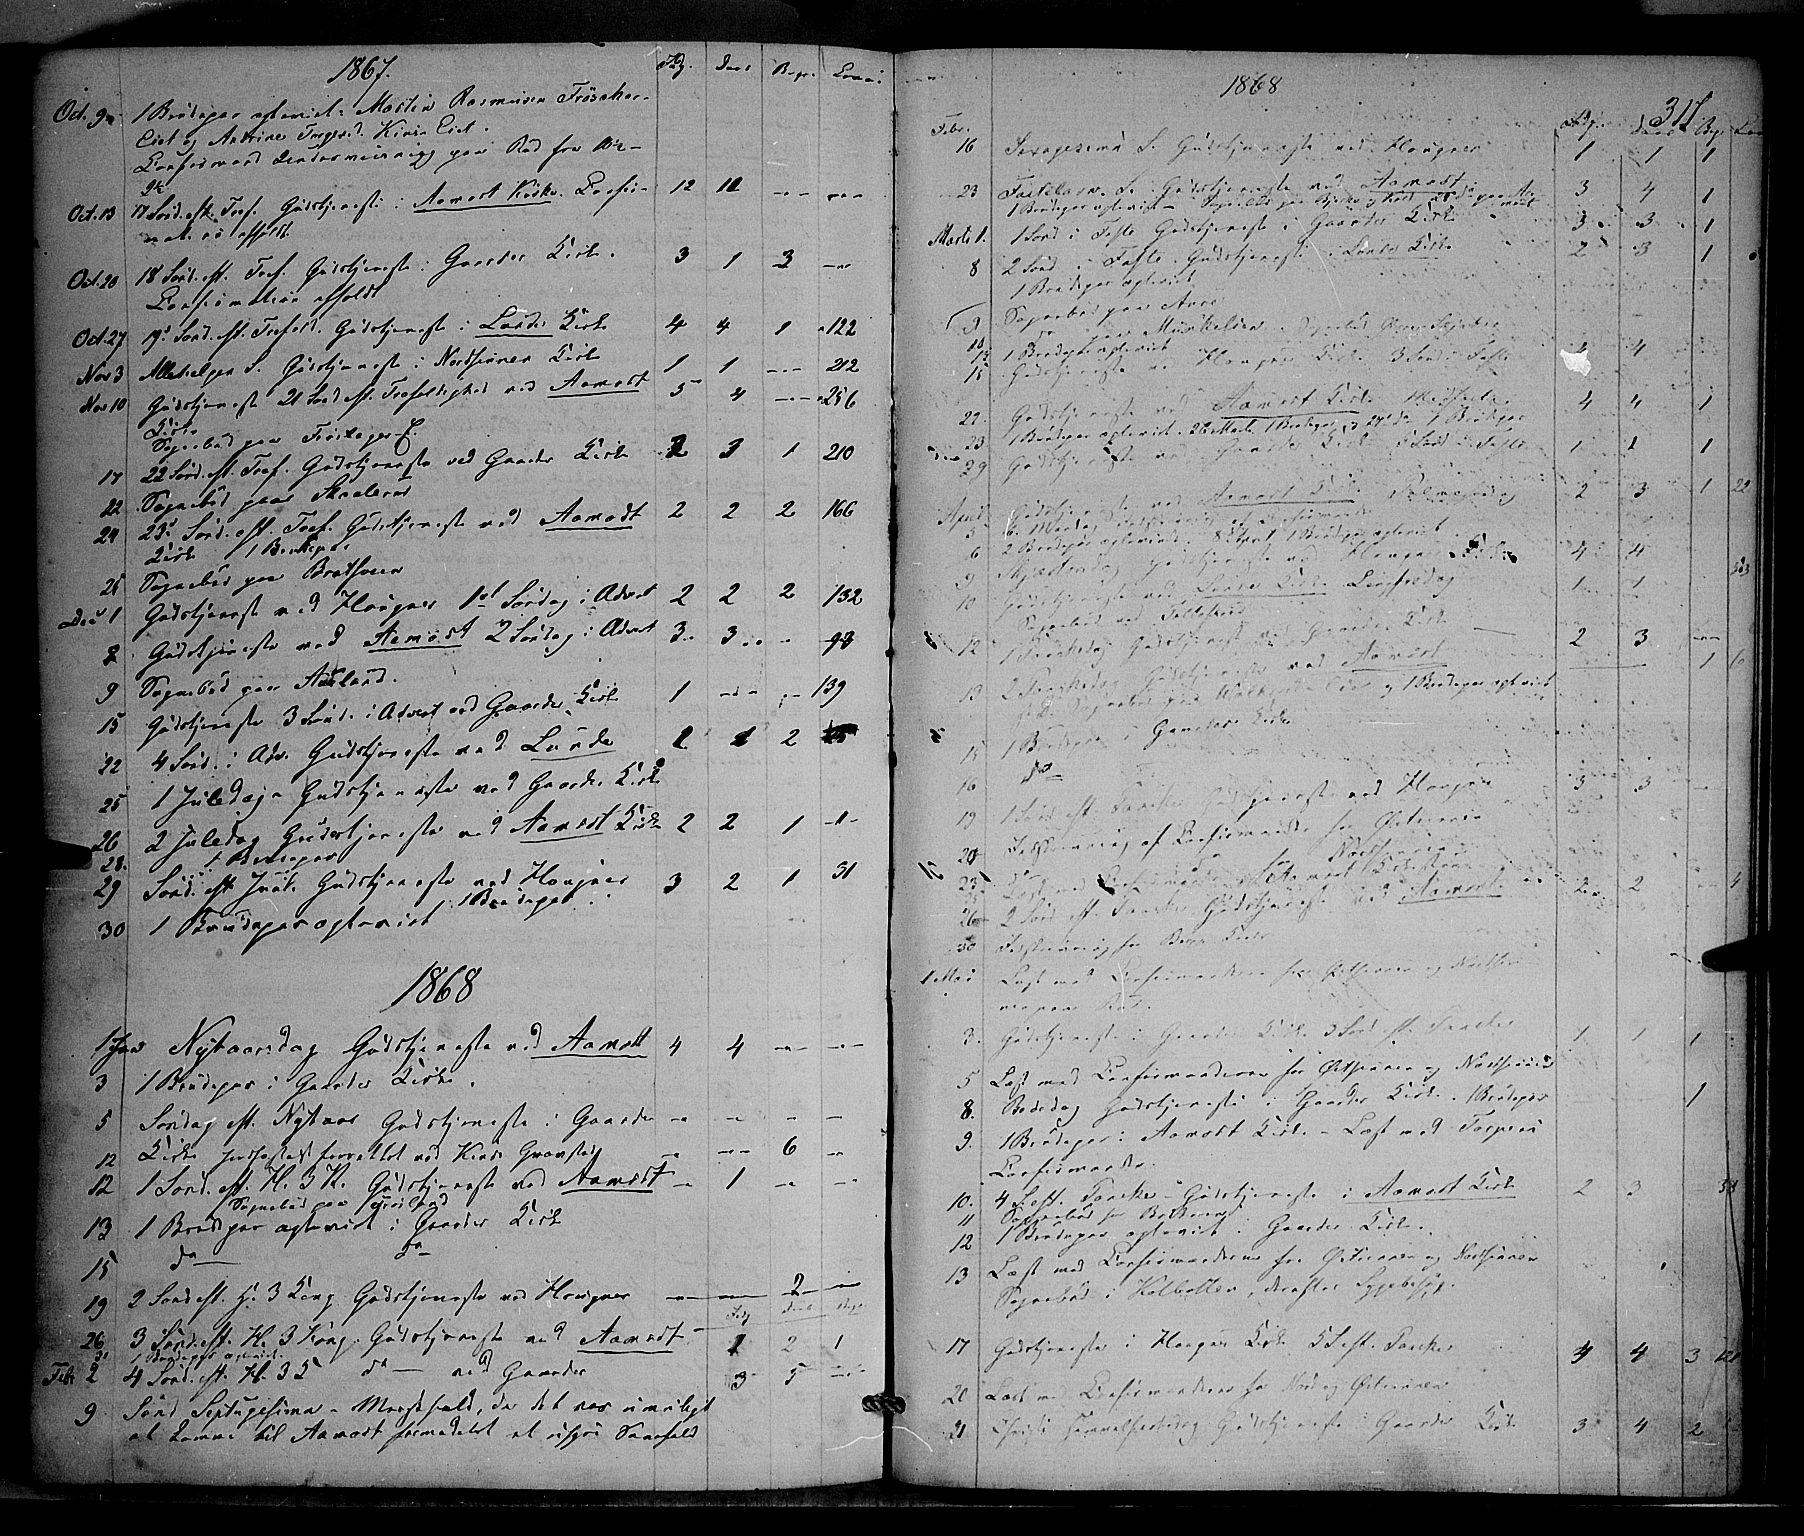 SAH, Nordre Land prestekontor, Ministerialbok nr. 1, 1860-1871, s. 317